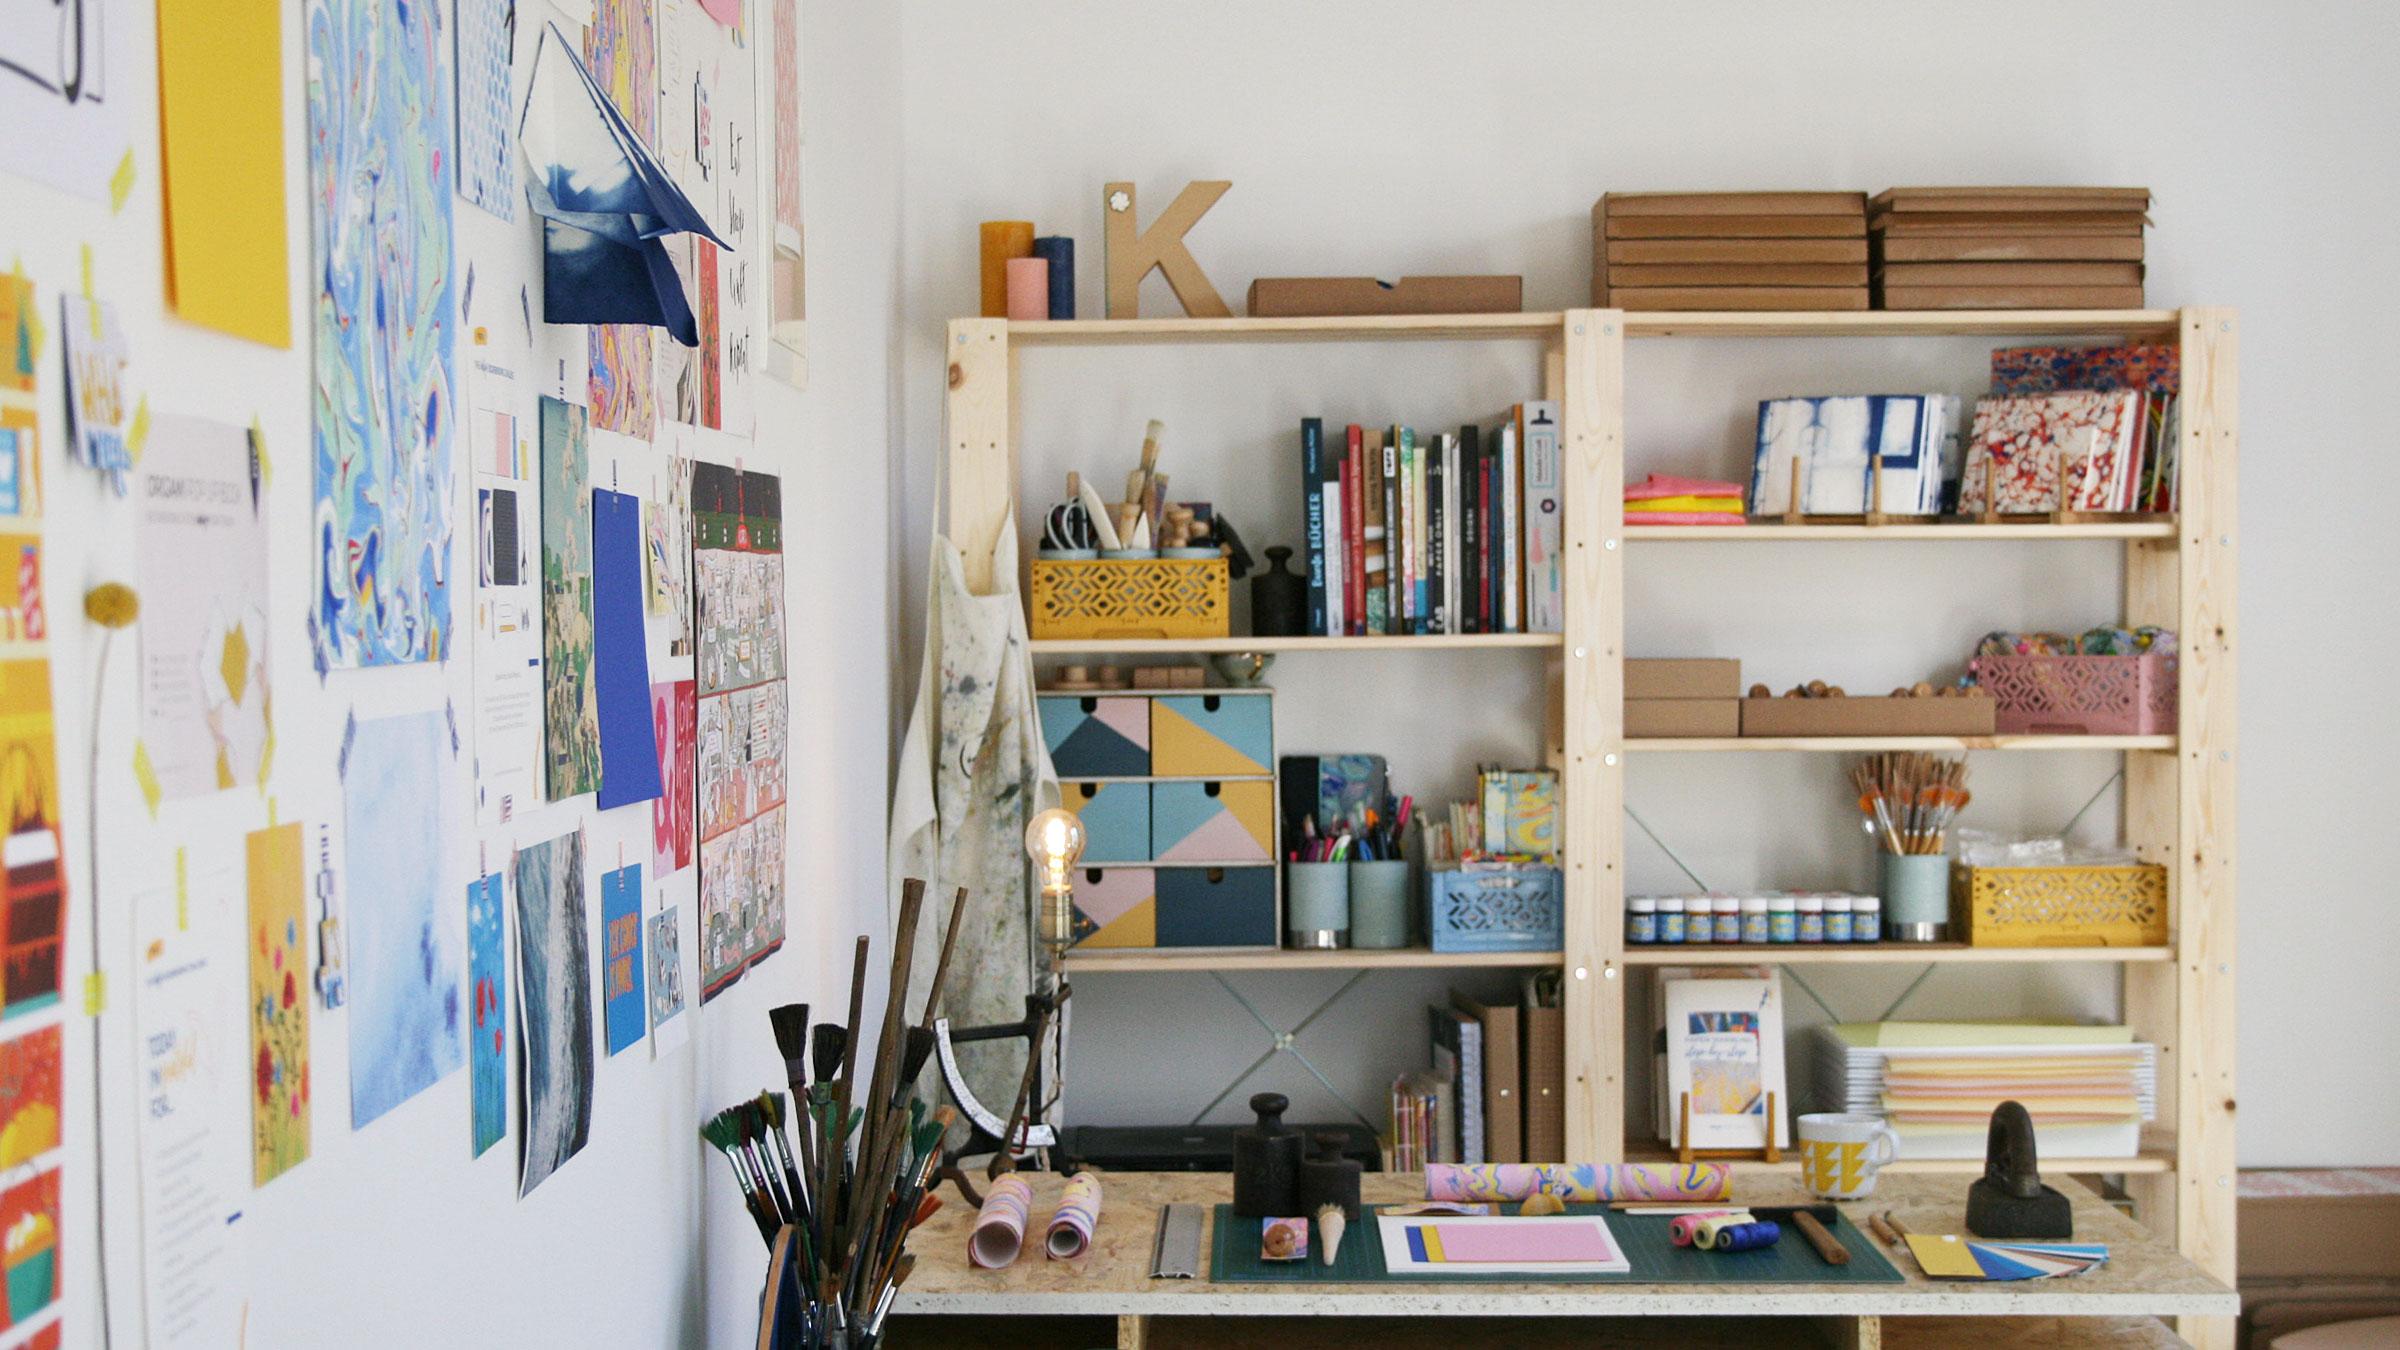 Indigo-Craft-Room-Paper-Studio-Munich-3